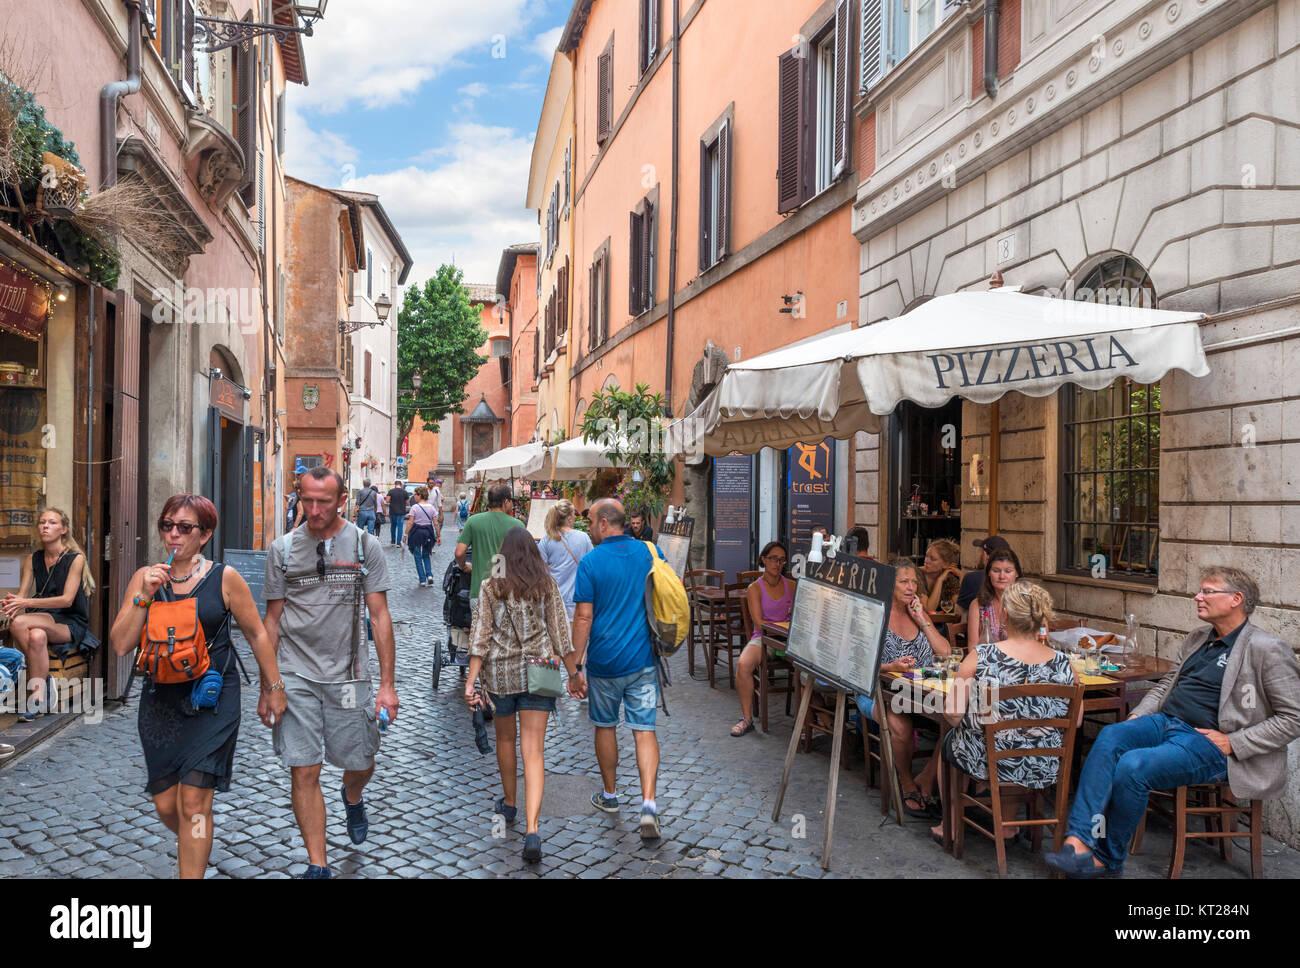 Sidewalk cafe and restaurant on Via della Scala, Trastevere, Rome, Italy - Stock Image